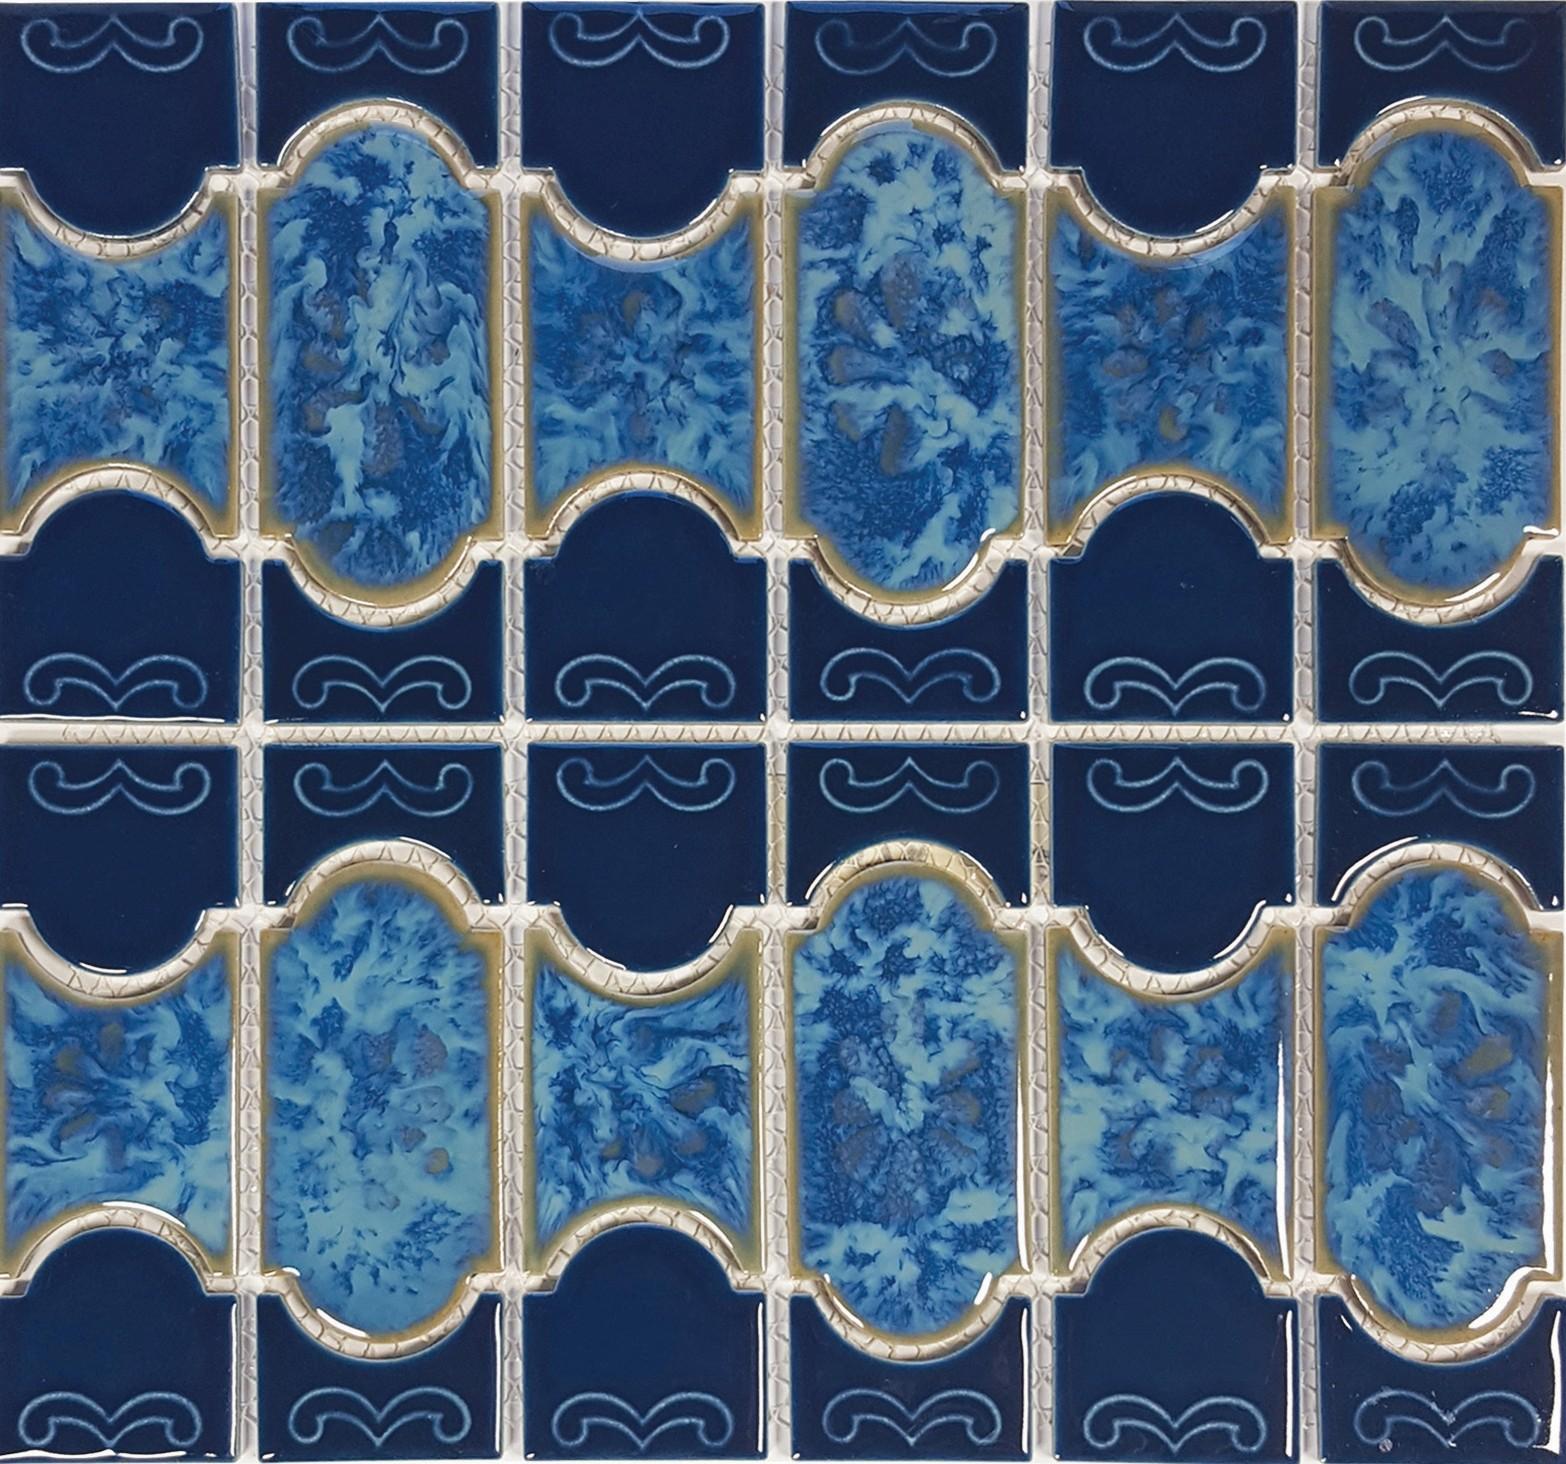 Caribbean Blue Mosaic (Botanical Series) Porcelain Pool Tile